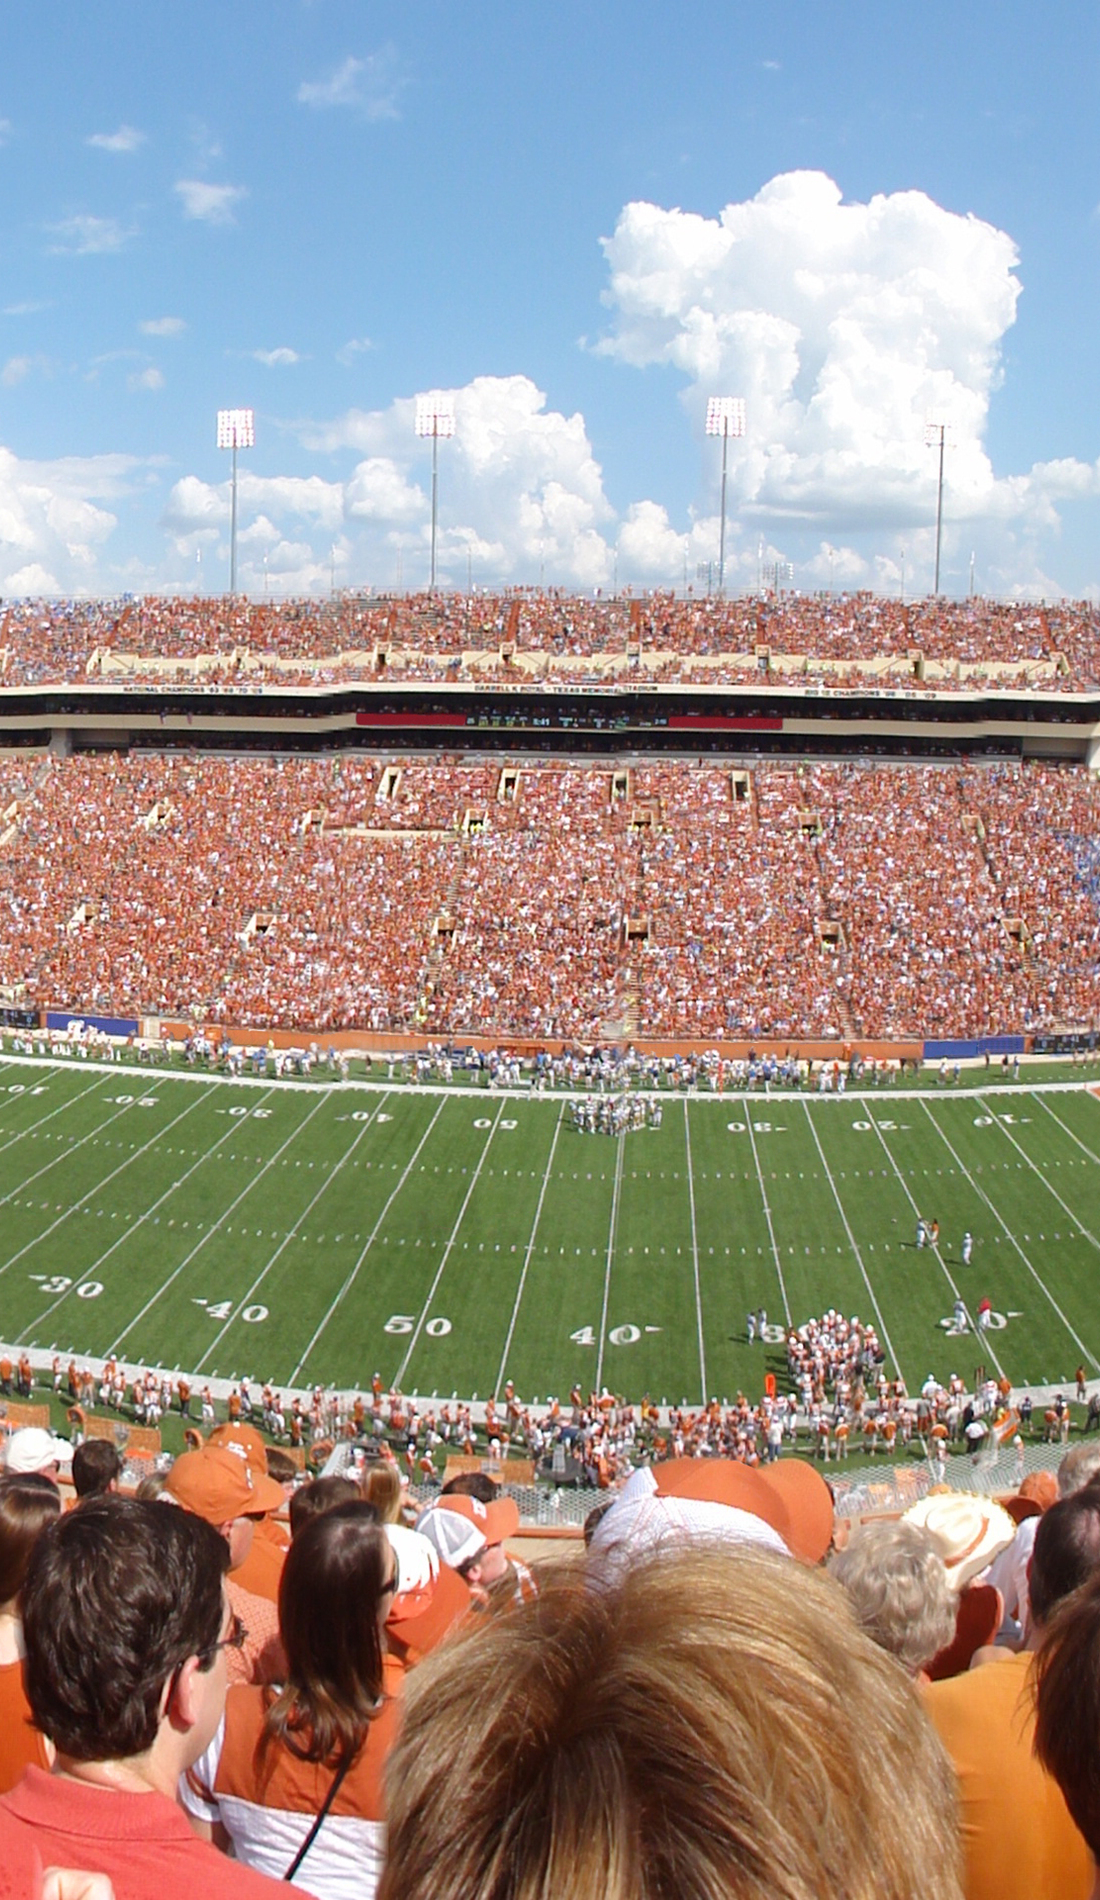 A Texas Longhorns Football live event